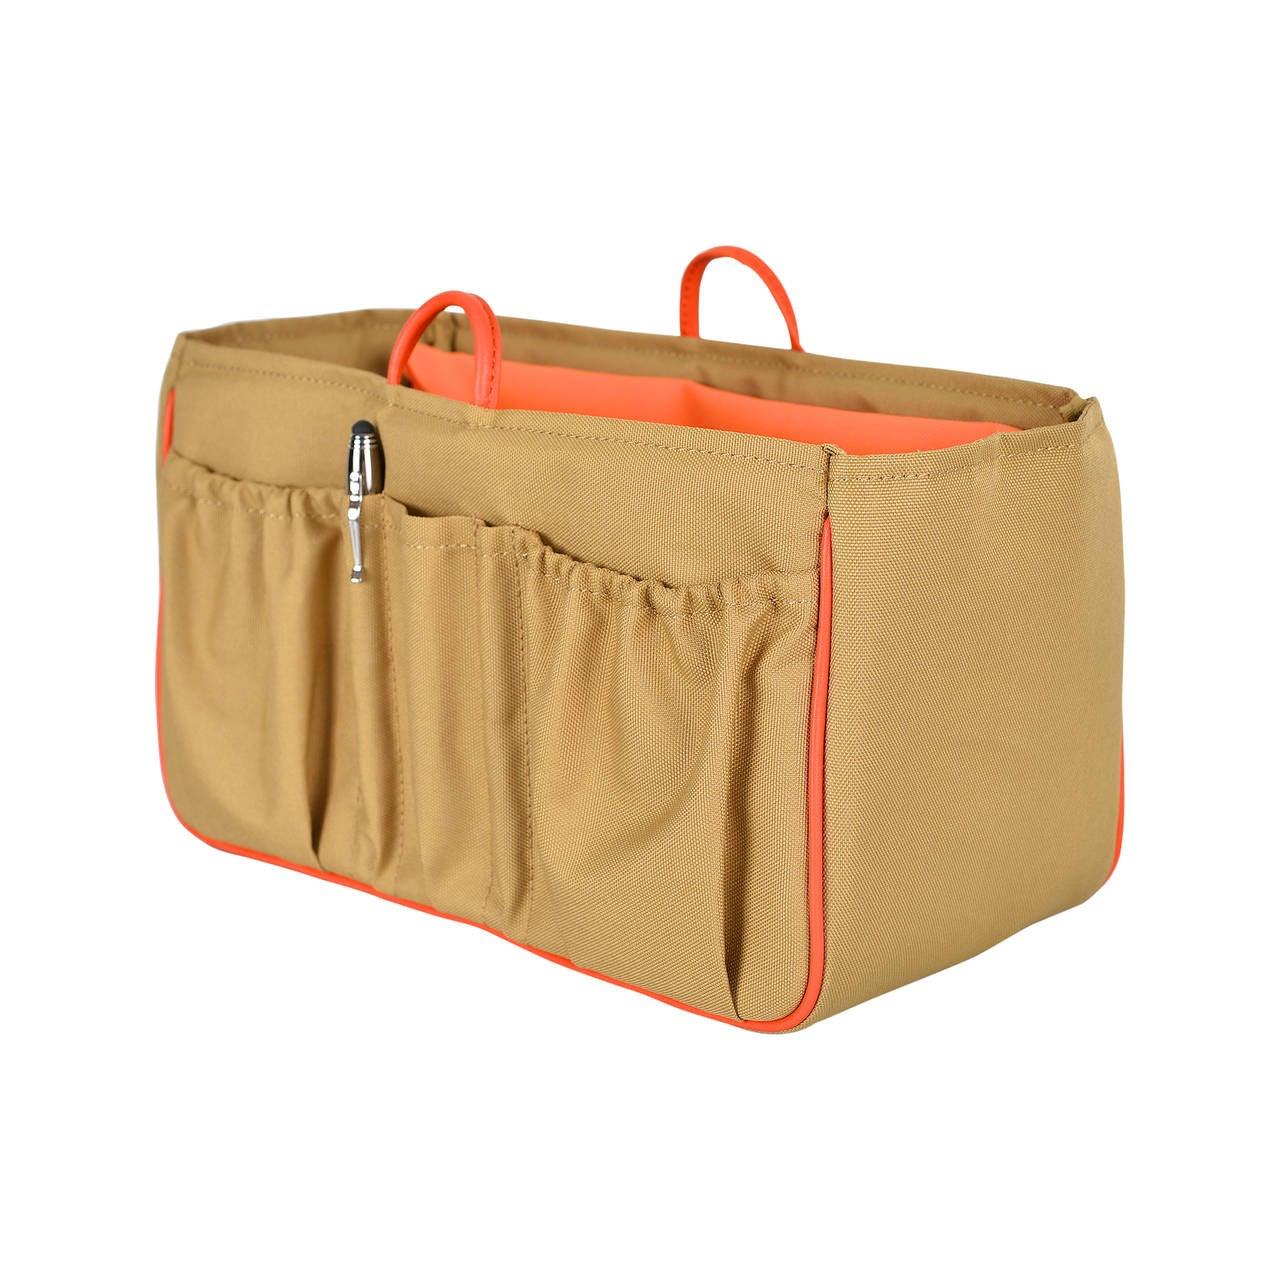 hermes paris handbag website - JANEFINDS BAGINIZER SZ SMALL FOR HERMES BIRKIN 30cm/KELLY 35cm ...